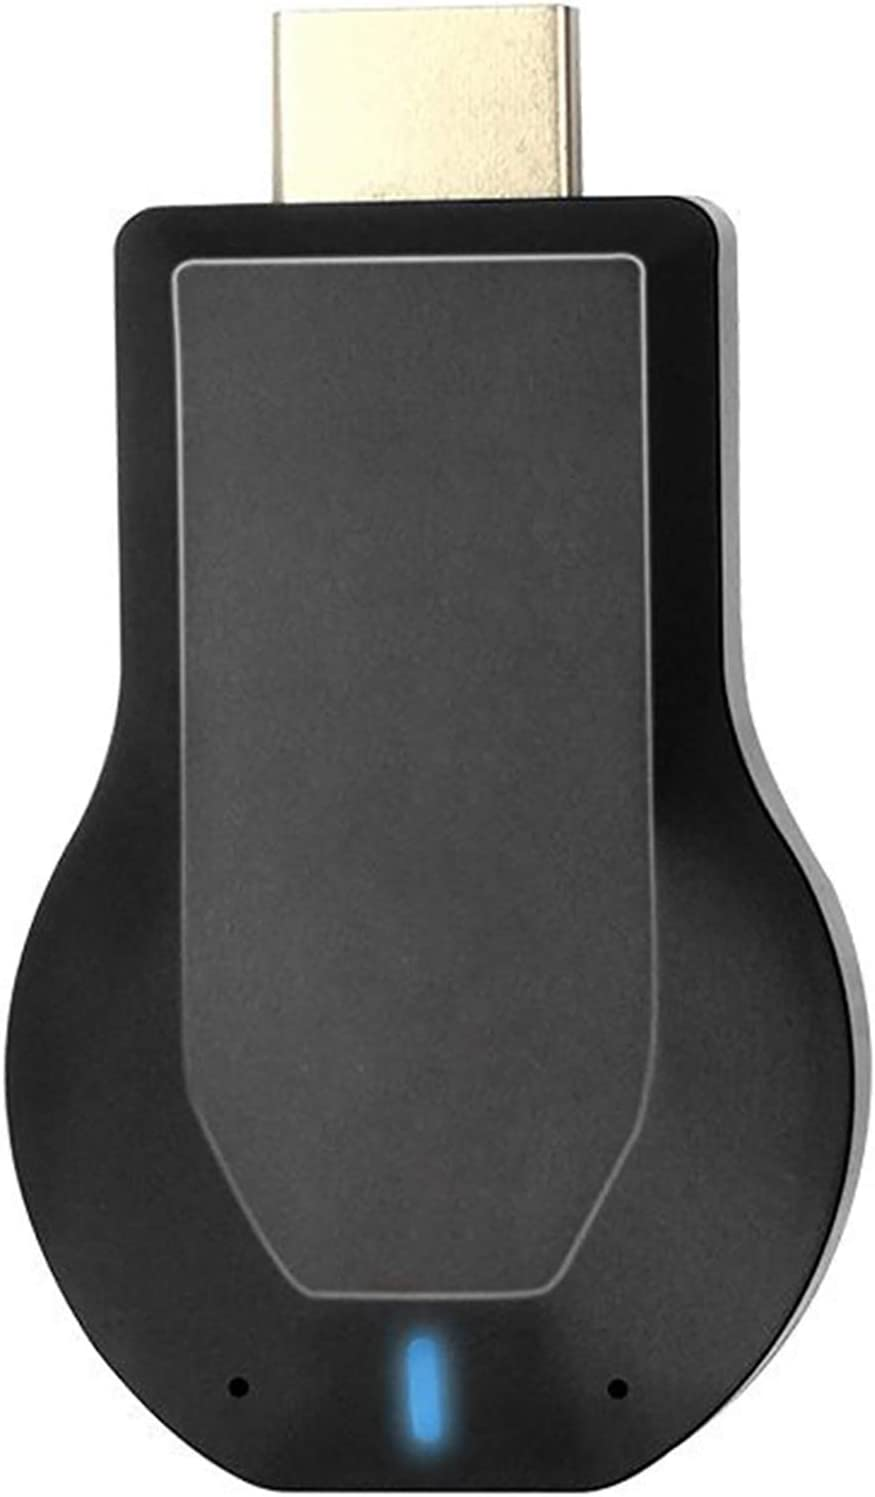 SOONHUA Receptor inalámbrico de pantalla dongle espejo 1080 p HDMI TV Stick ayuda Airplay DLNA Miracast